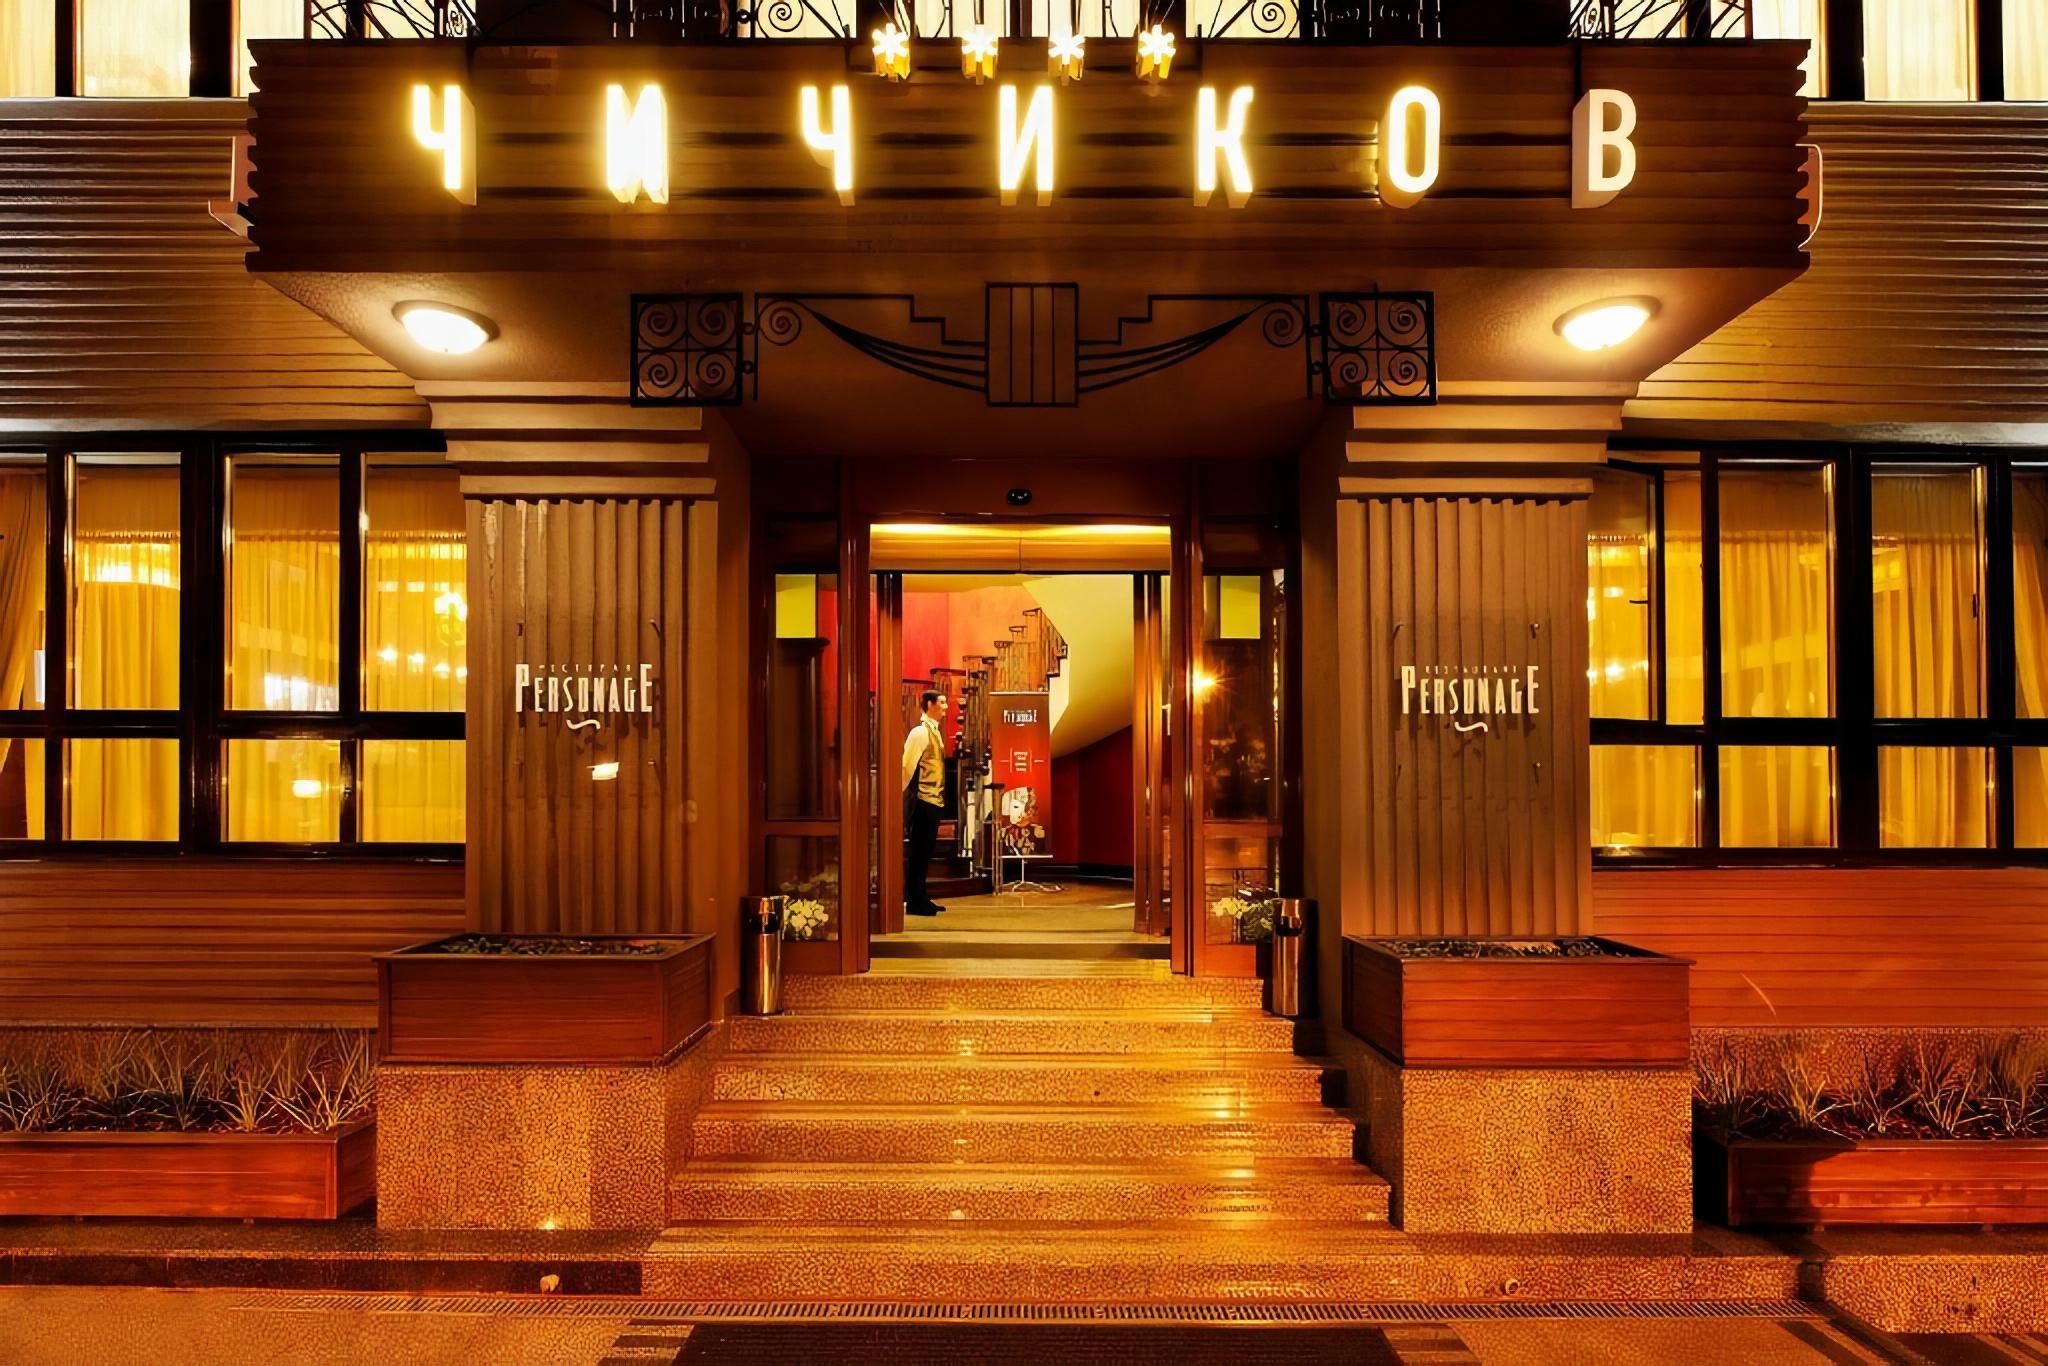 Entrance to the Chichikov Hotel